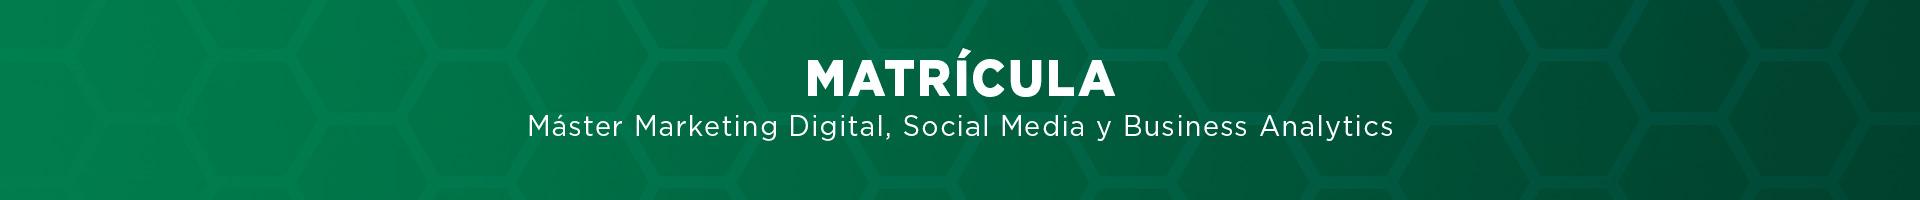 matricula-master-online